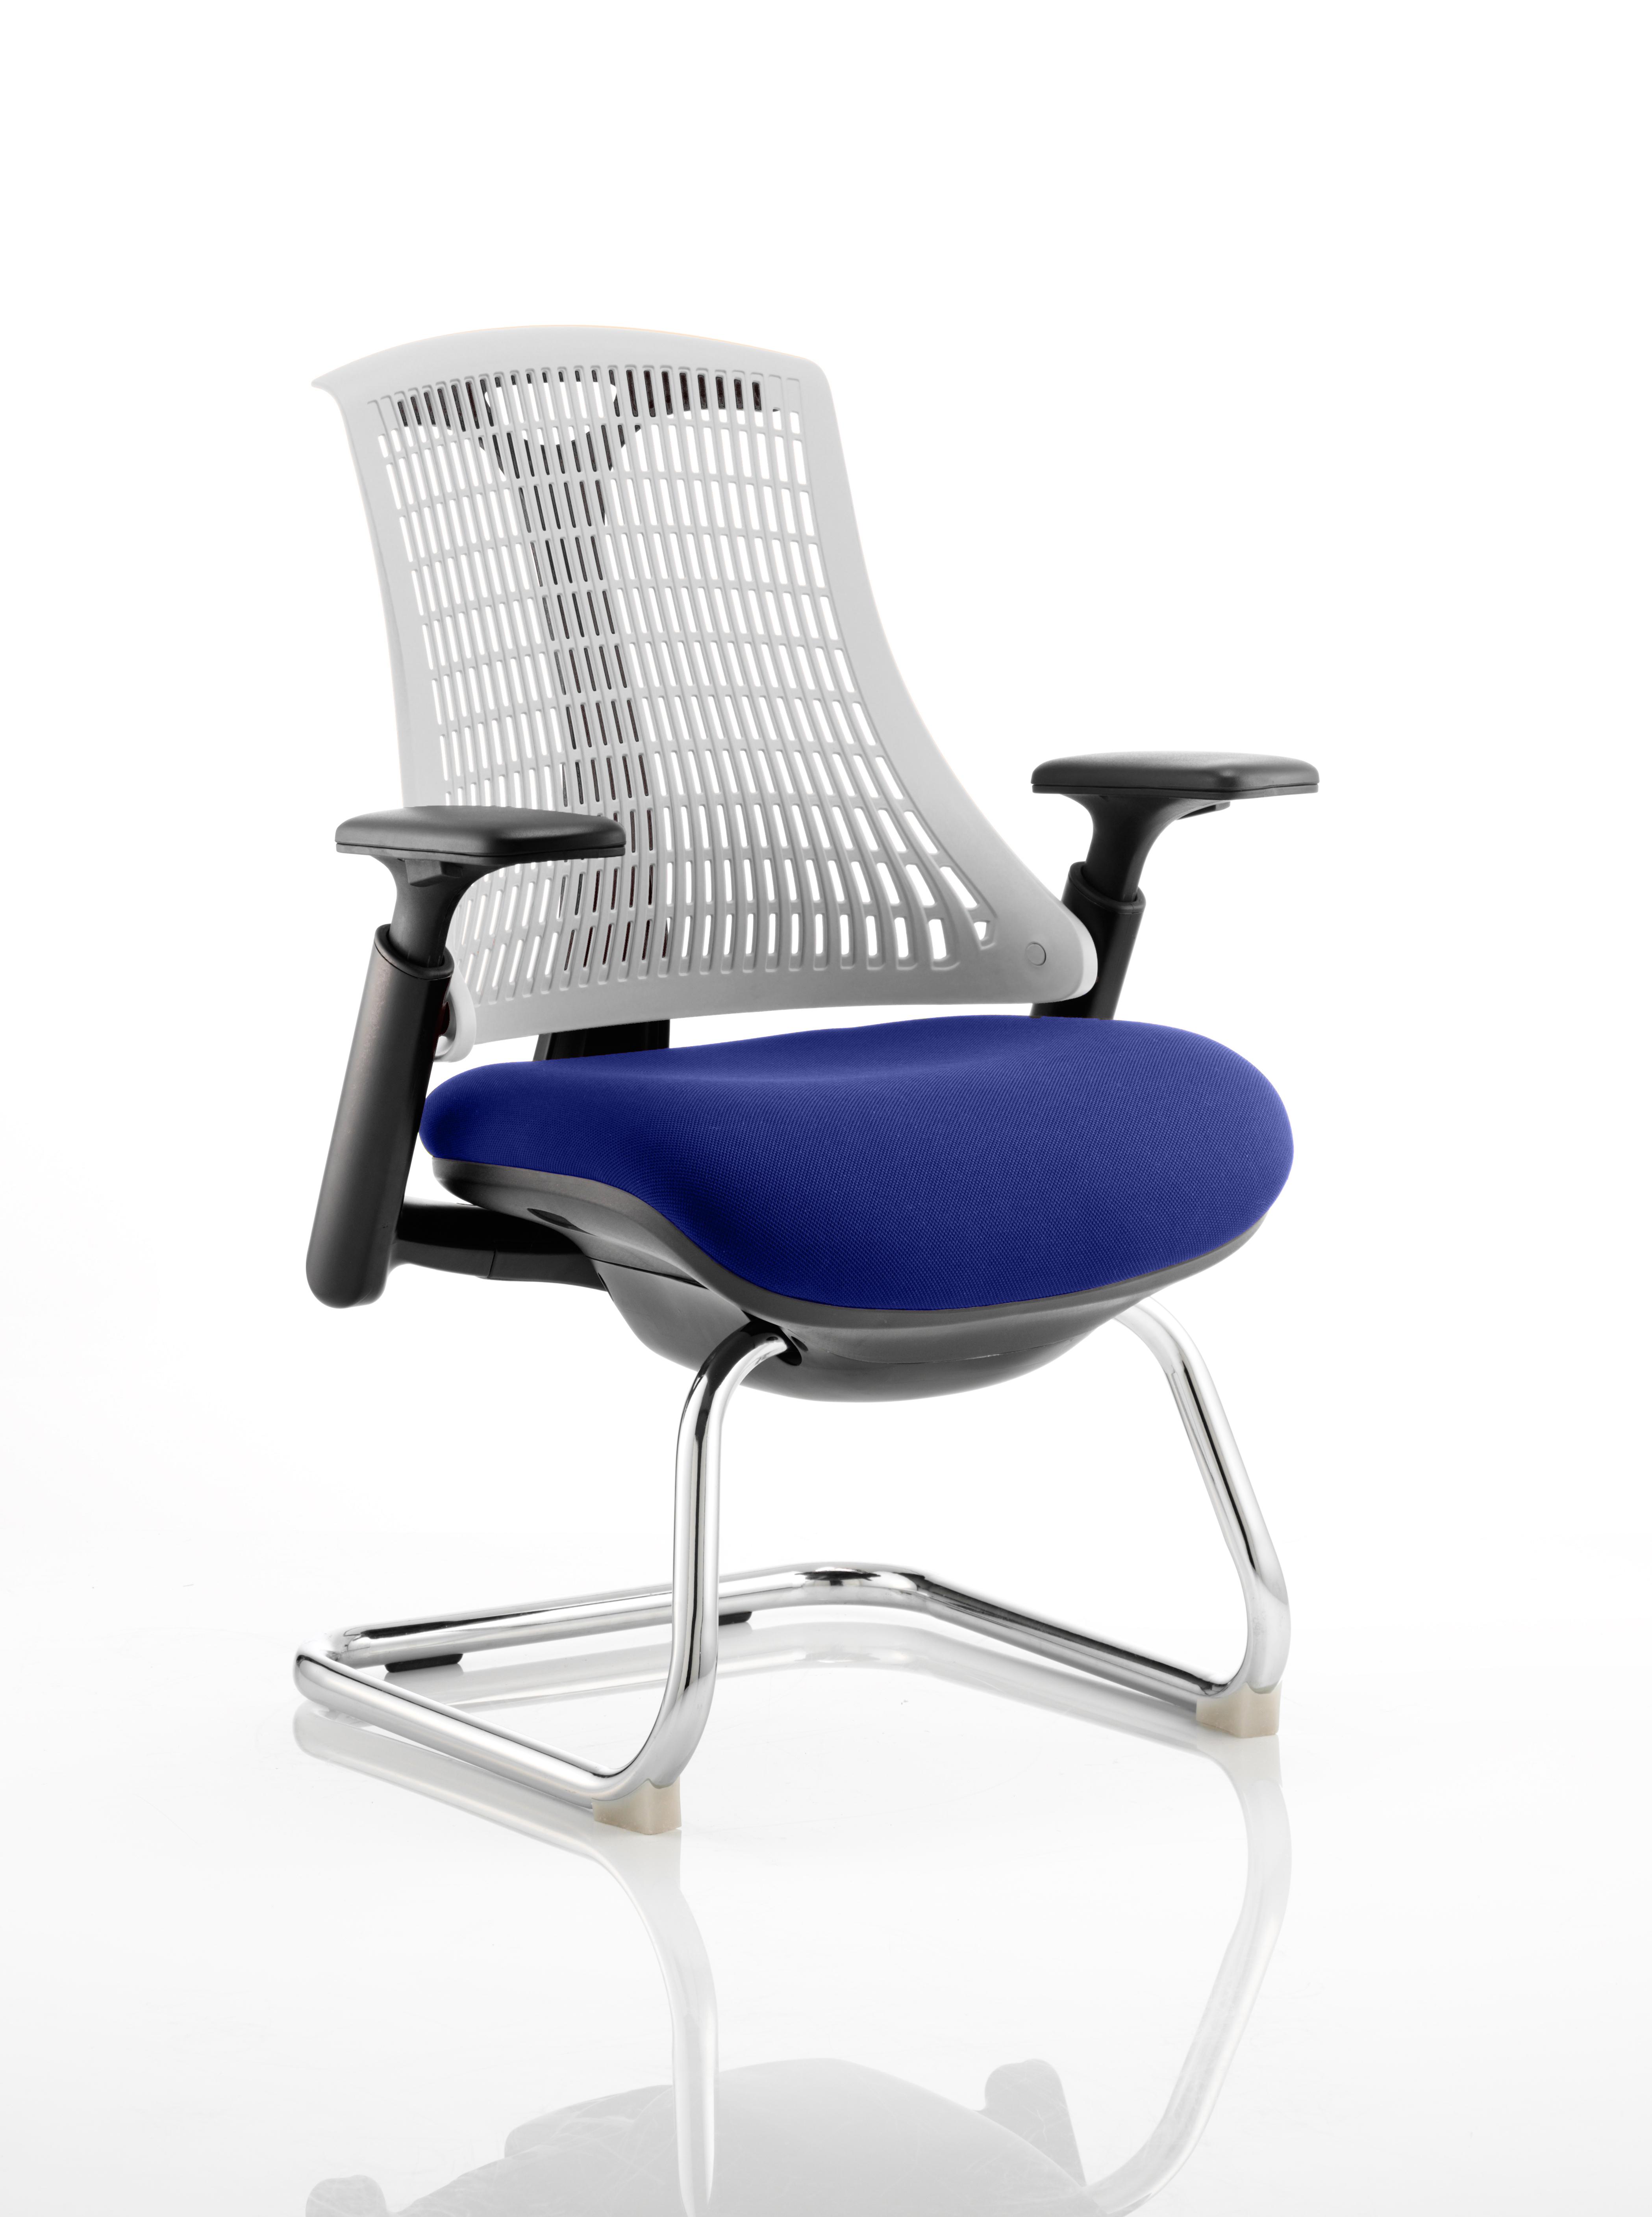 Flex Cantilever Chair Black Frame White Back Bespoke Colour Seat Stevia Blue